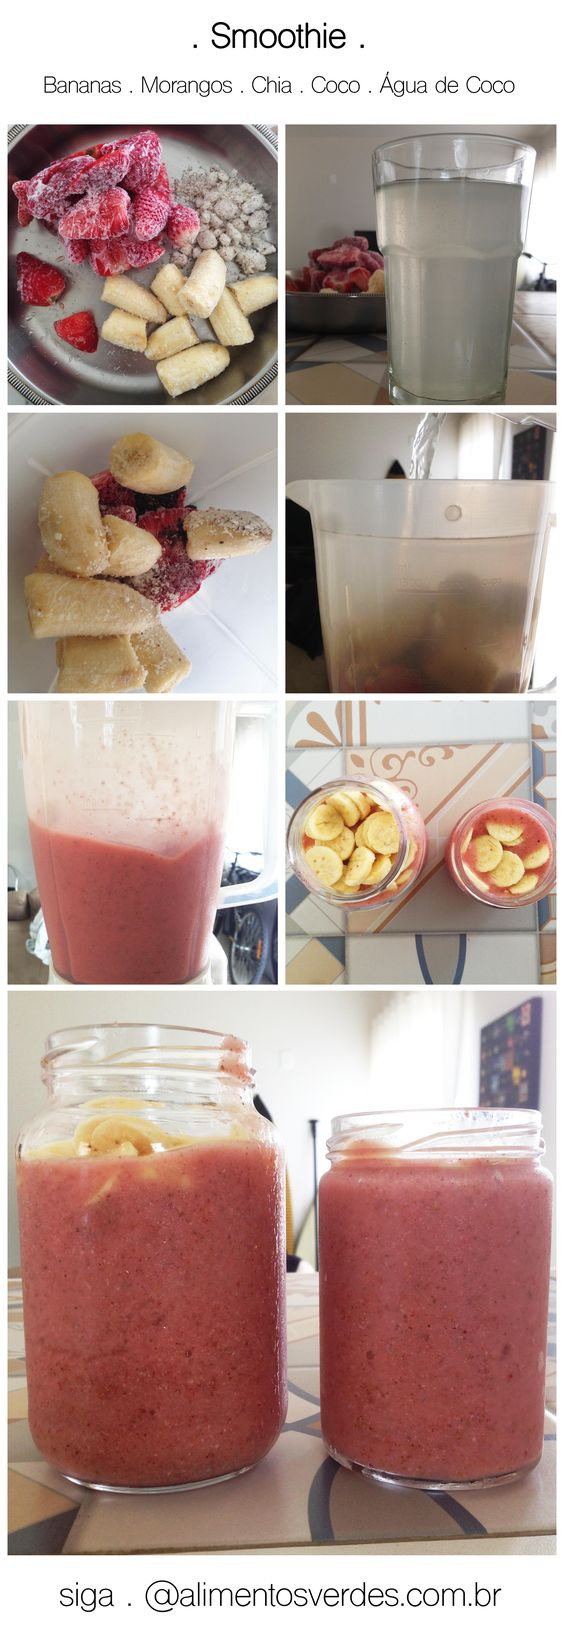 smoothie-banana-morango-coco-chia